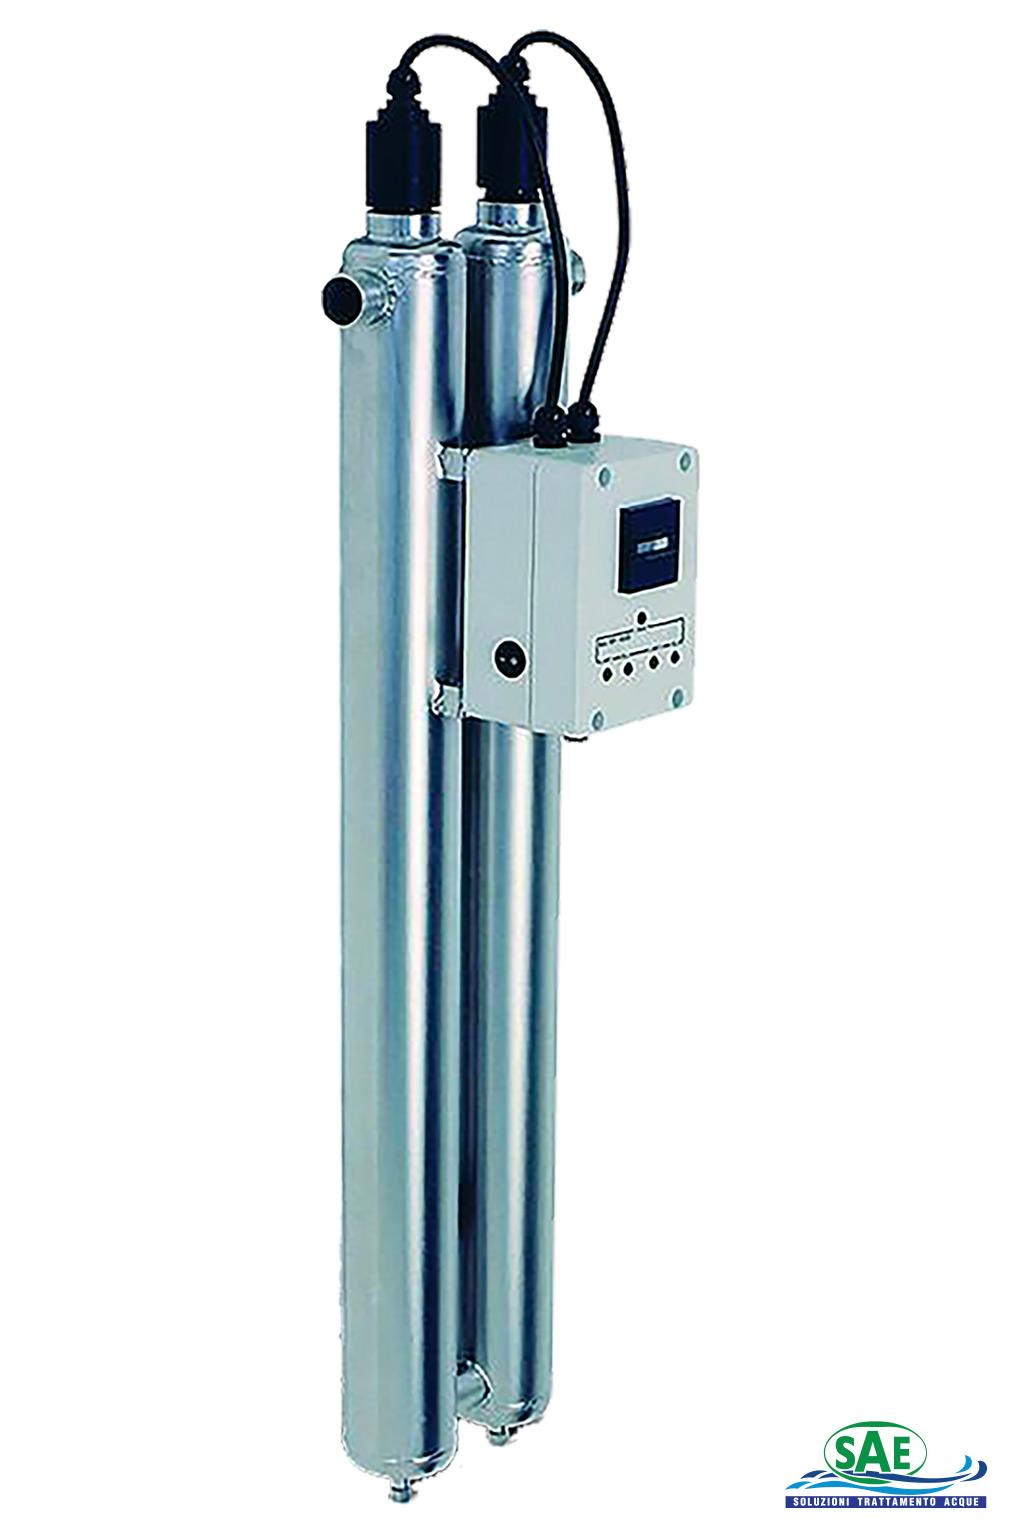 Debatterizzatori UV | SAE TECNOLOGY